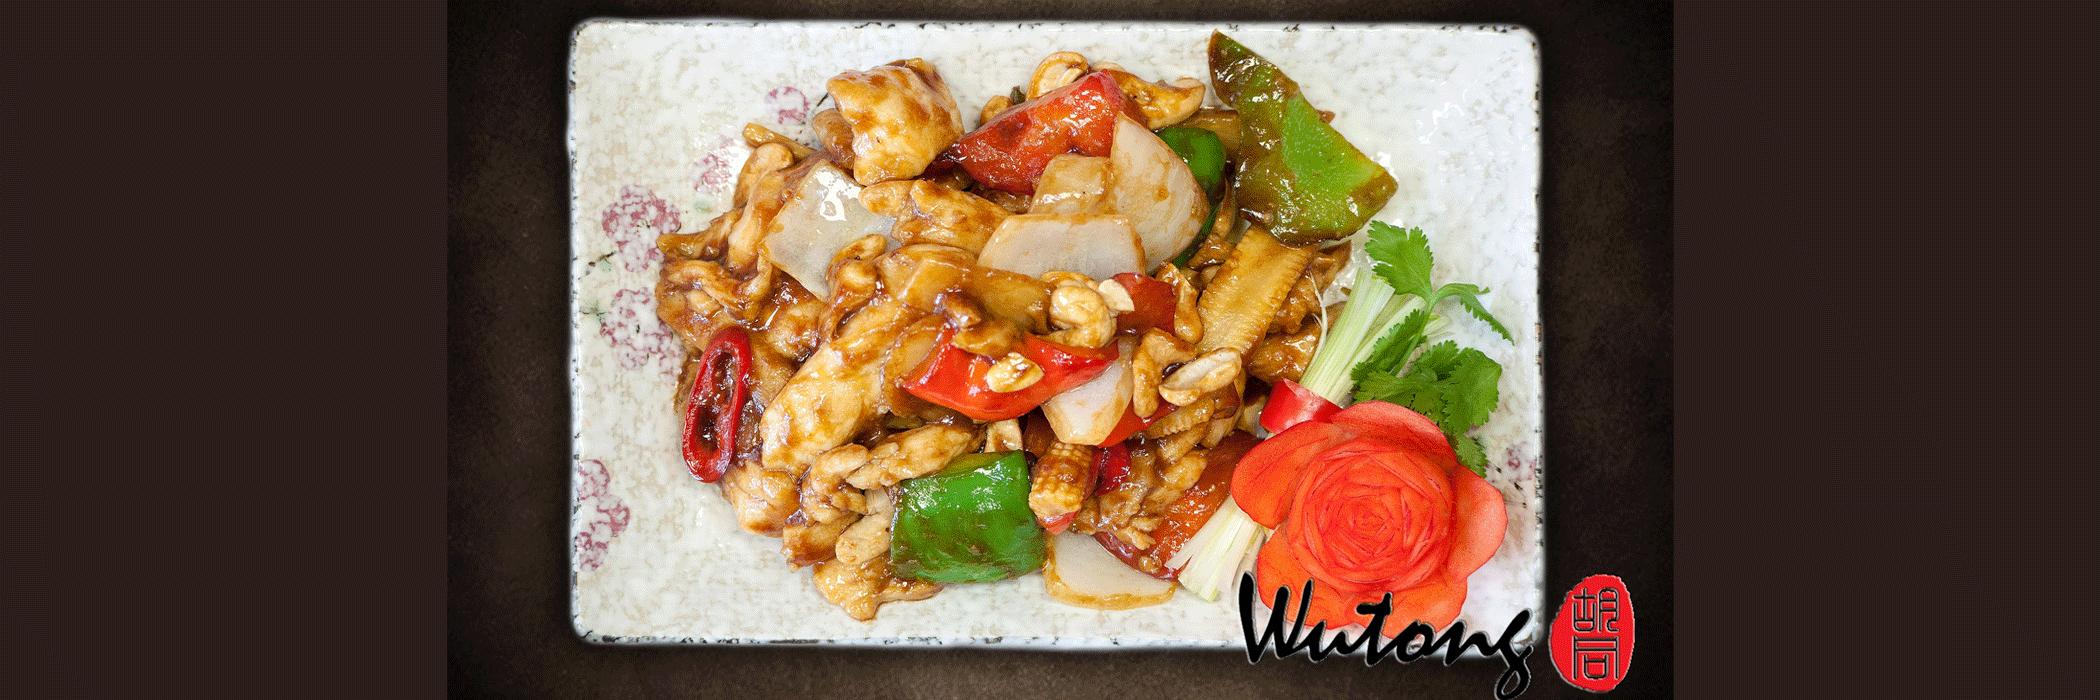 Wu Tong Milngavie chinese takeaway and restaurant